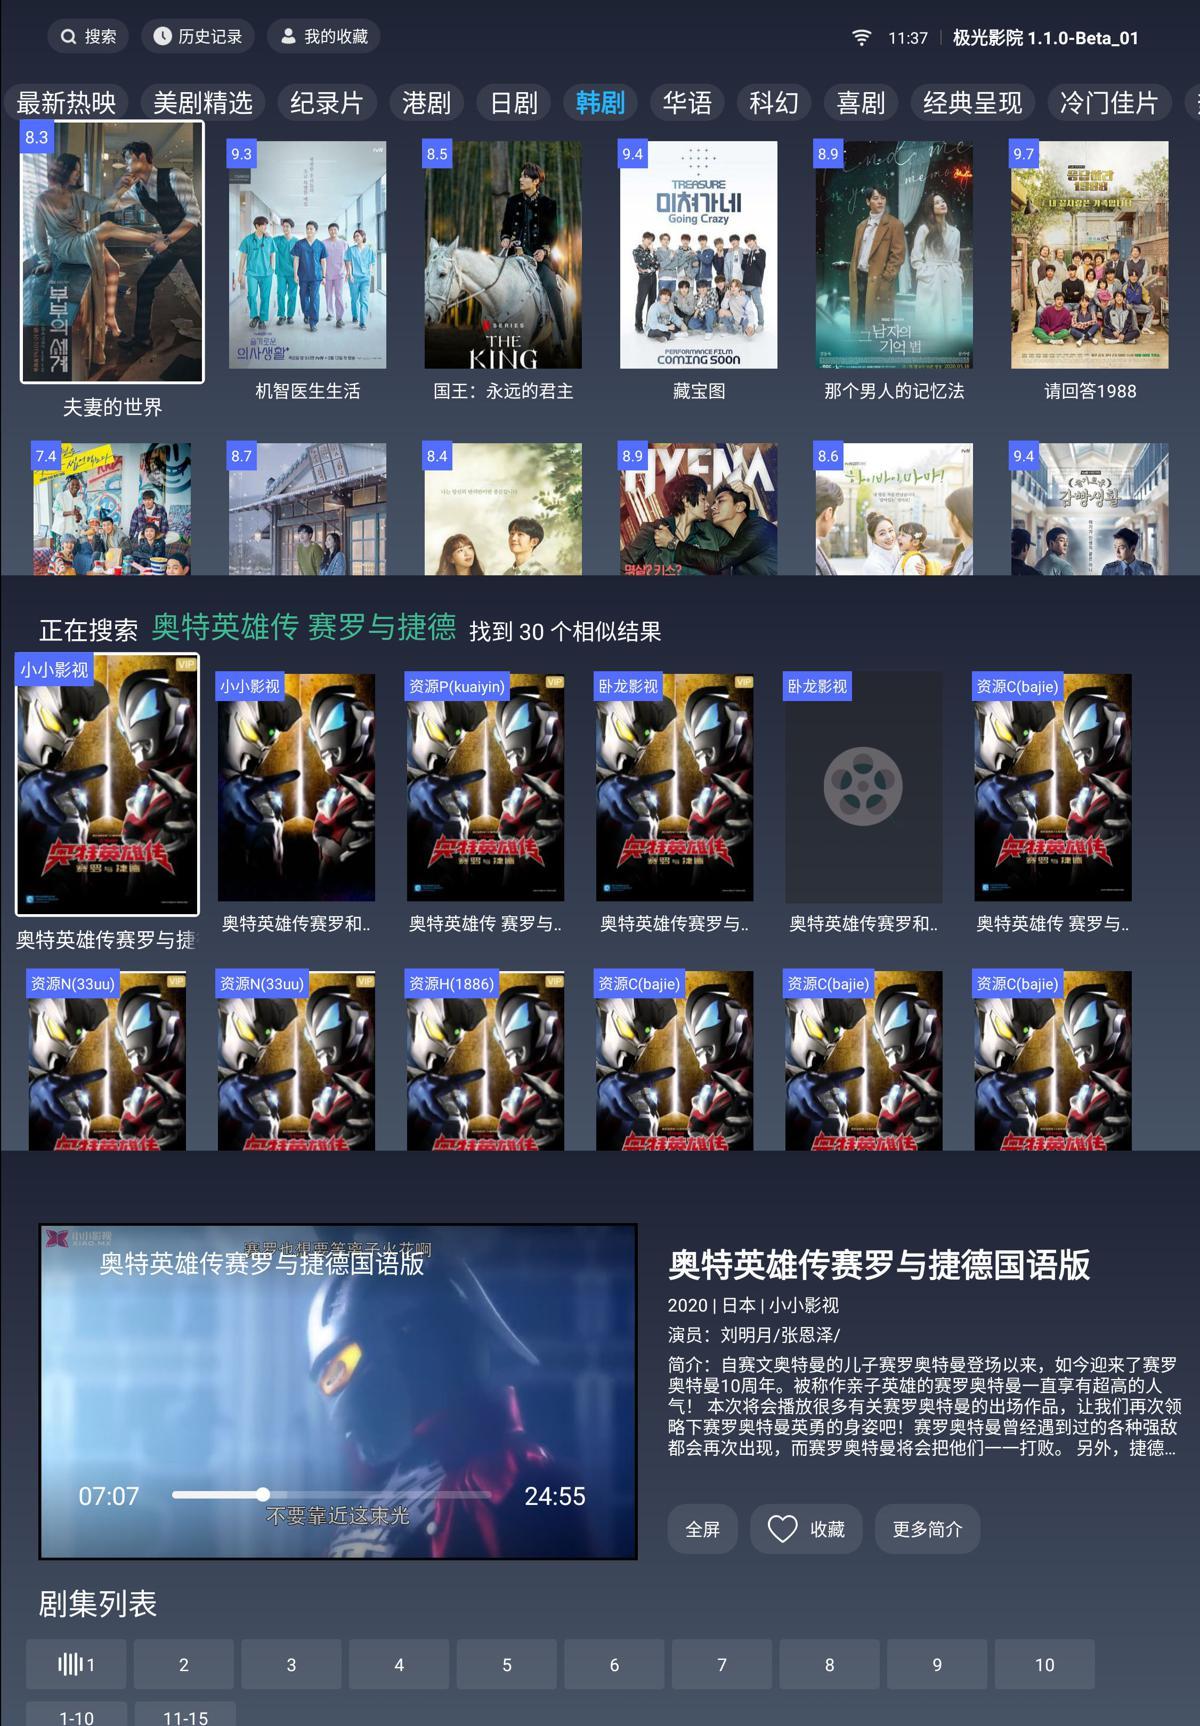 极光影院TV v1.1.5.2纯净版